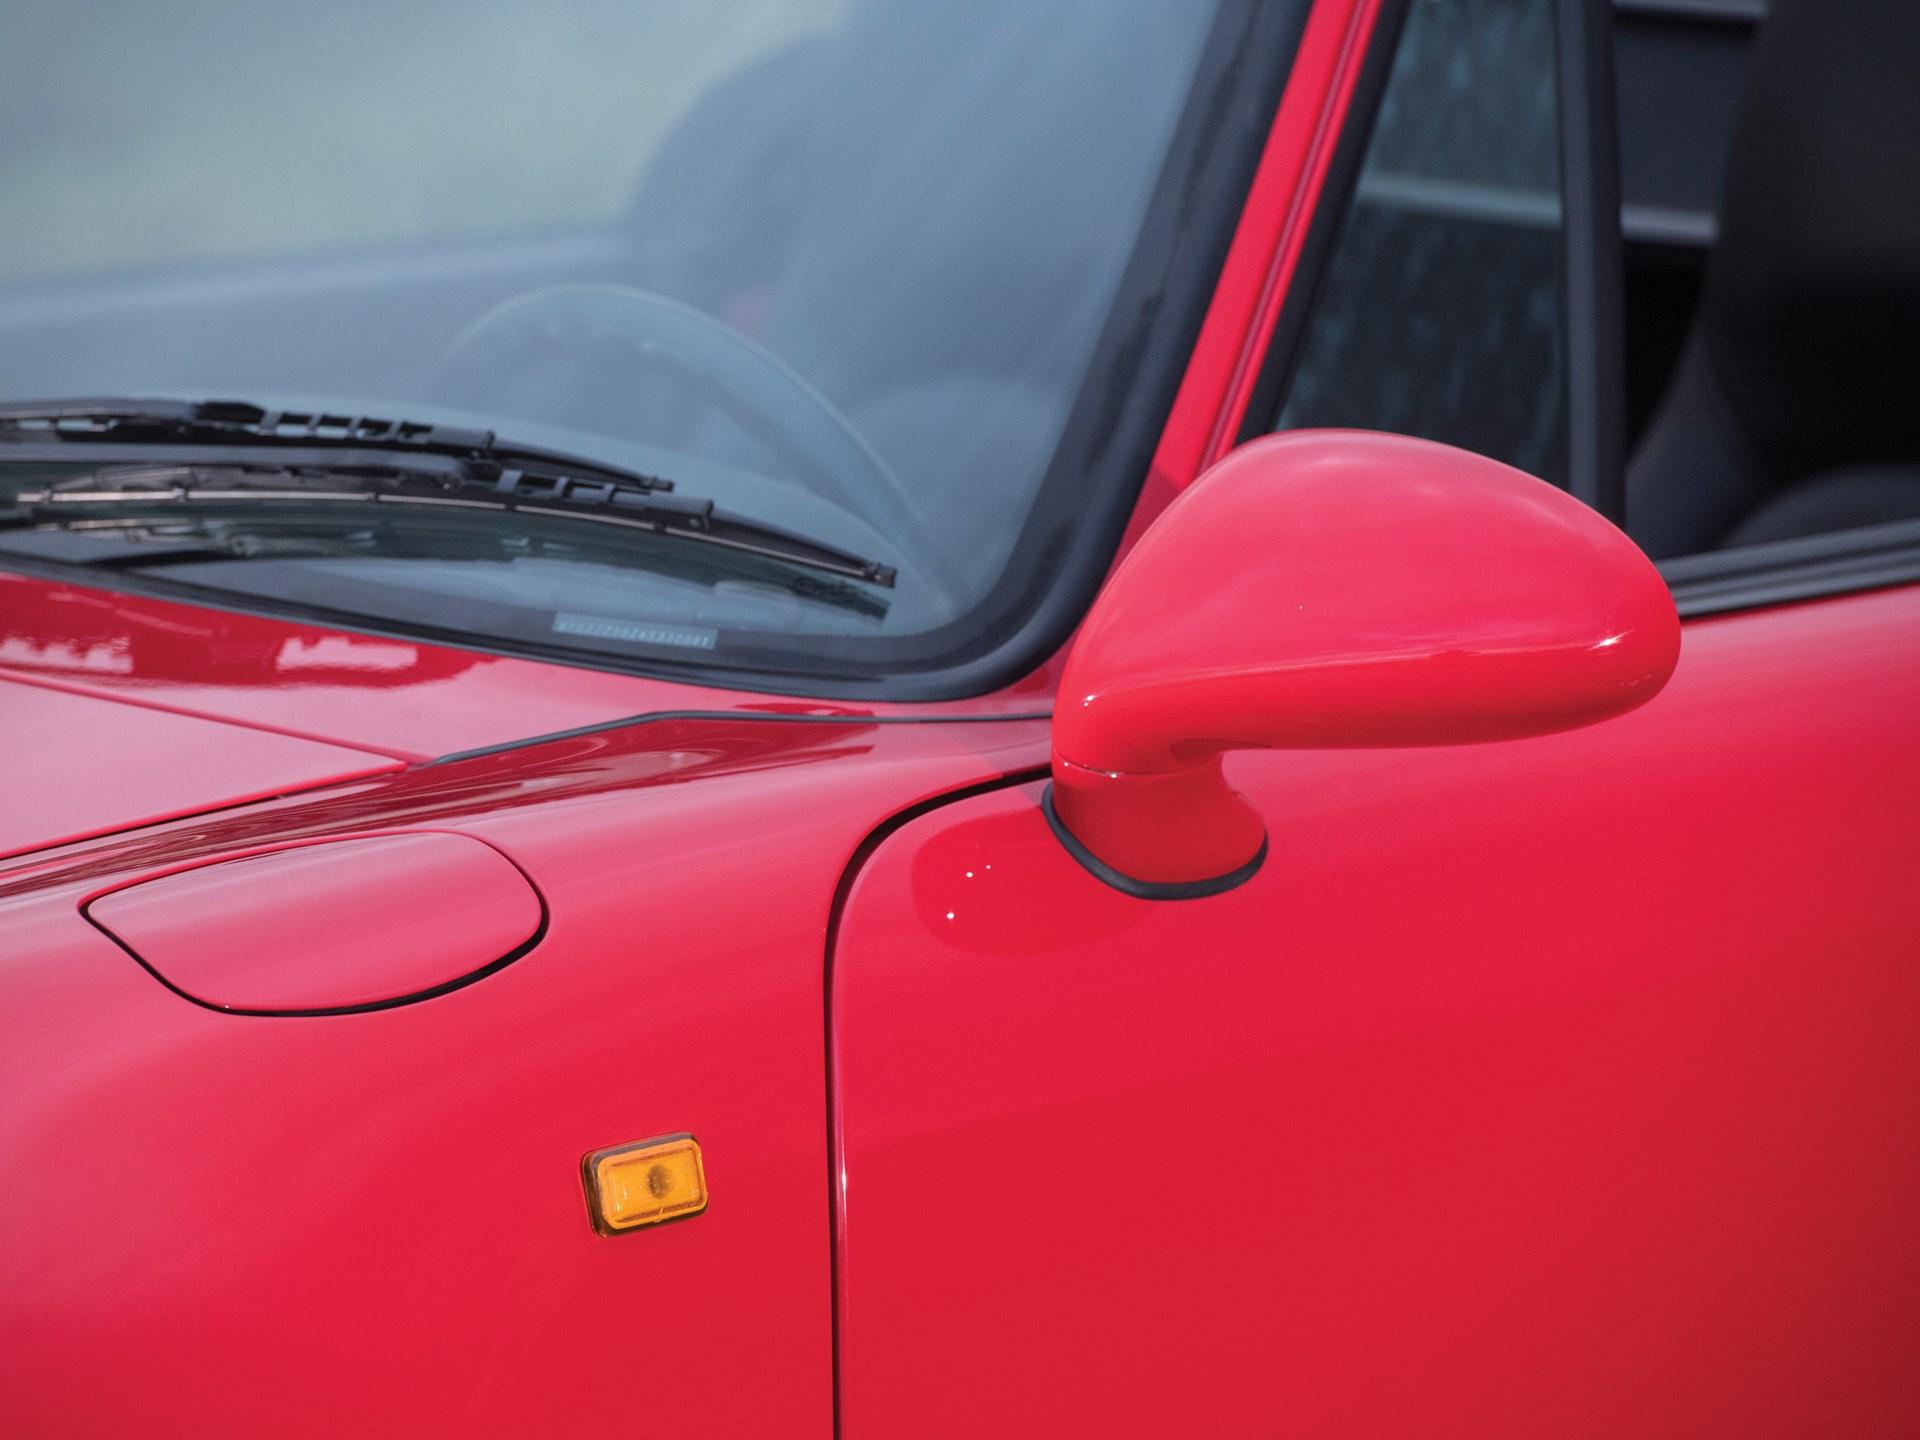 1998 Porsche 911 Carrera S Cabriolet